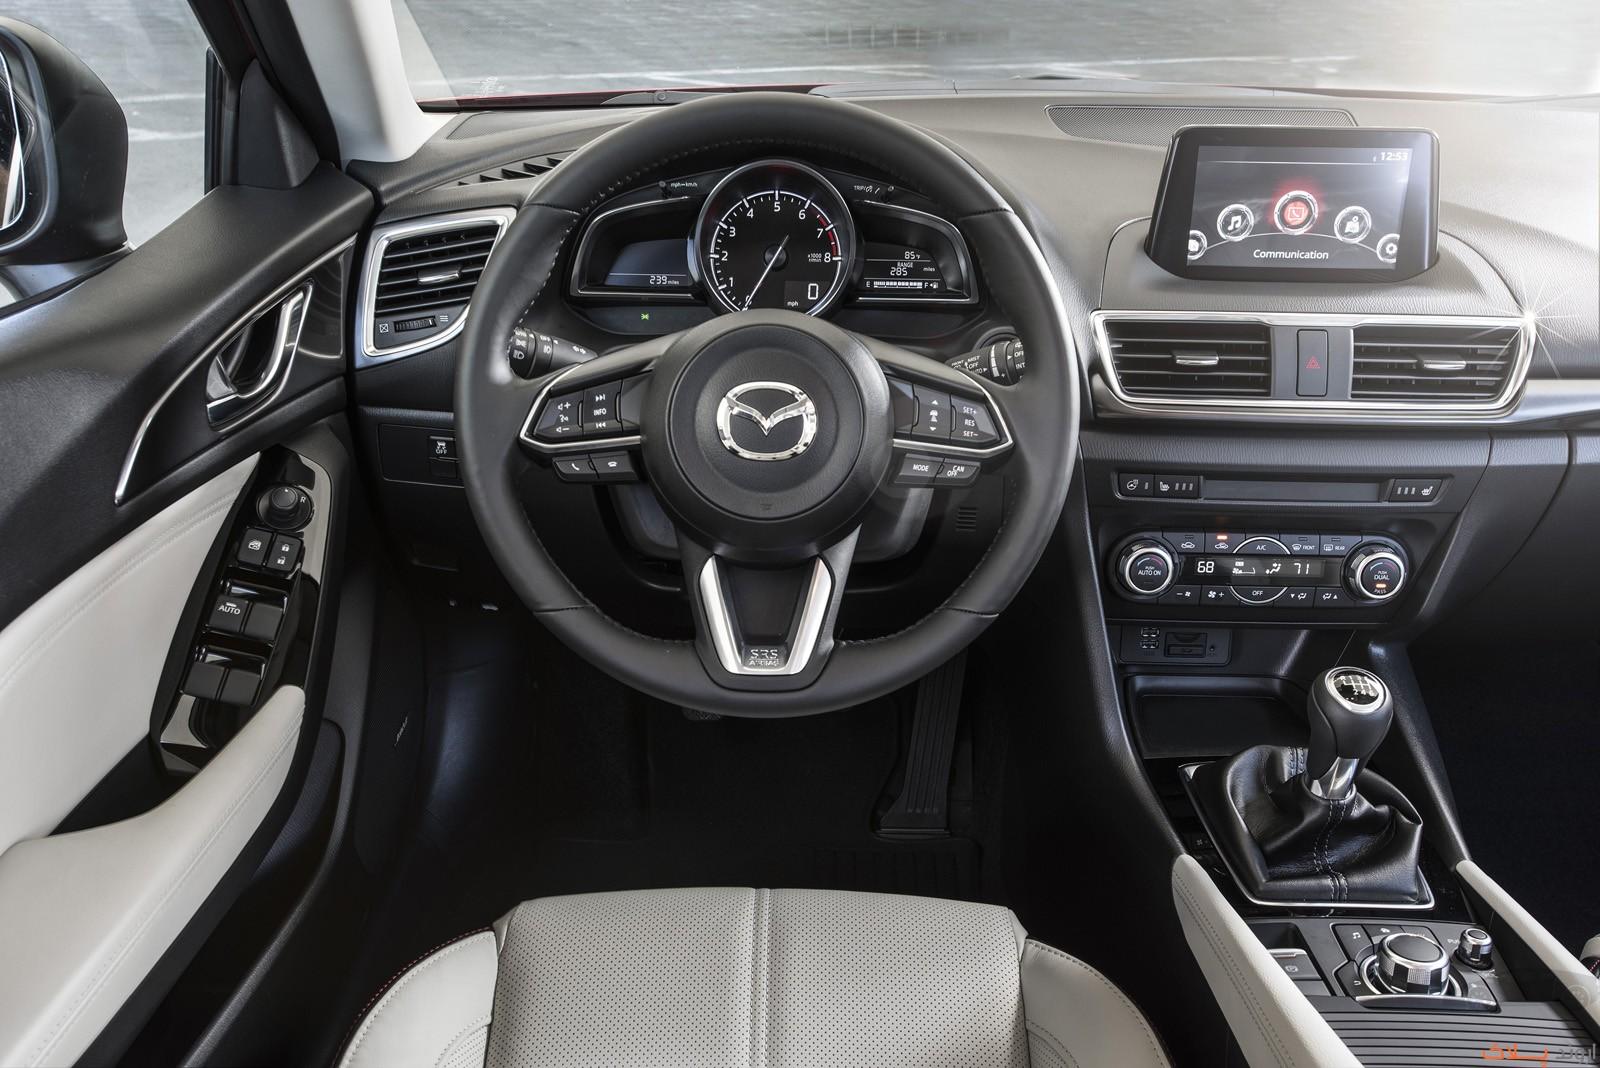 2017 Mazda3 26 1 اجاره مزدا نیو بدون راننده   اجاره ماشین